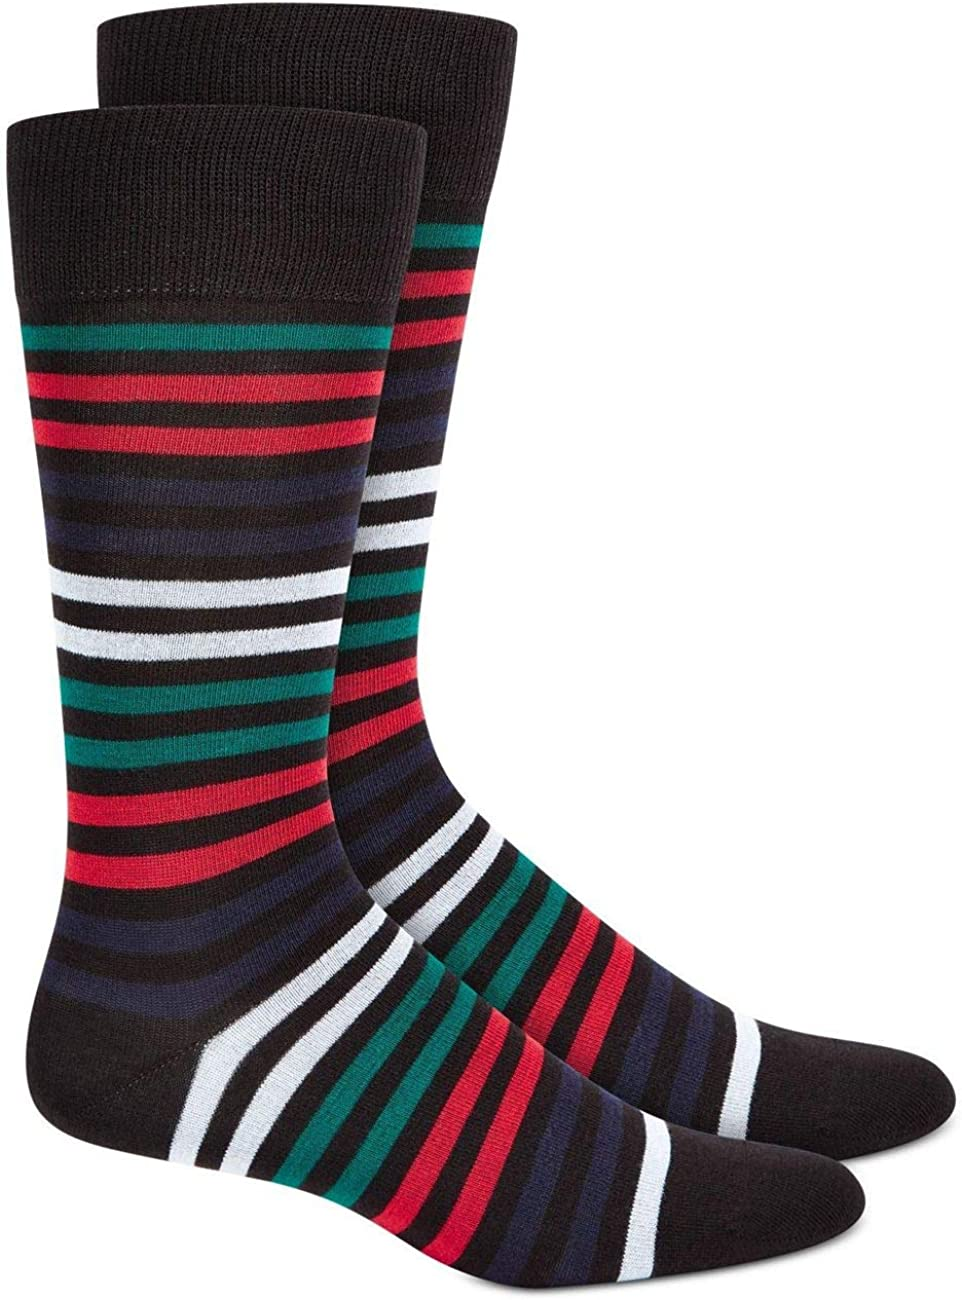 AlfaTech by Alfani Men's Striped Dress Socks